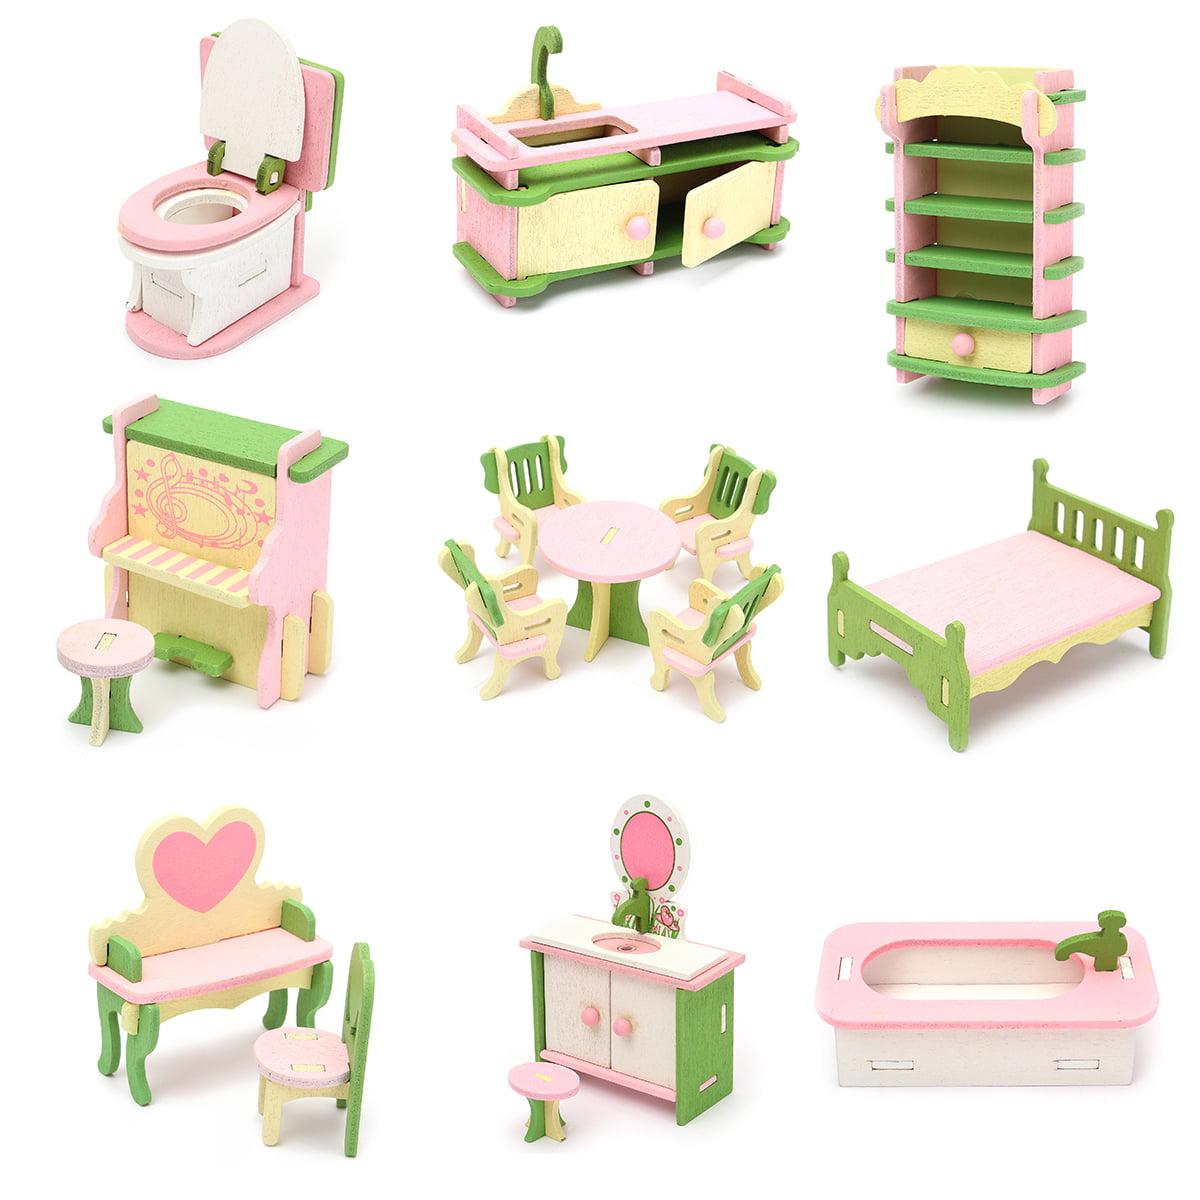 Wood Family Doll Dollhouse Furniture SetDolls House Miniature